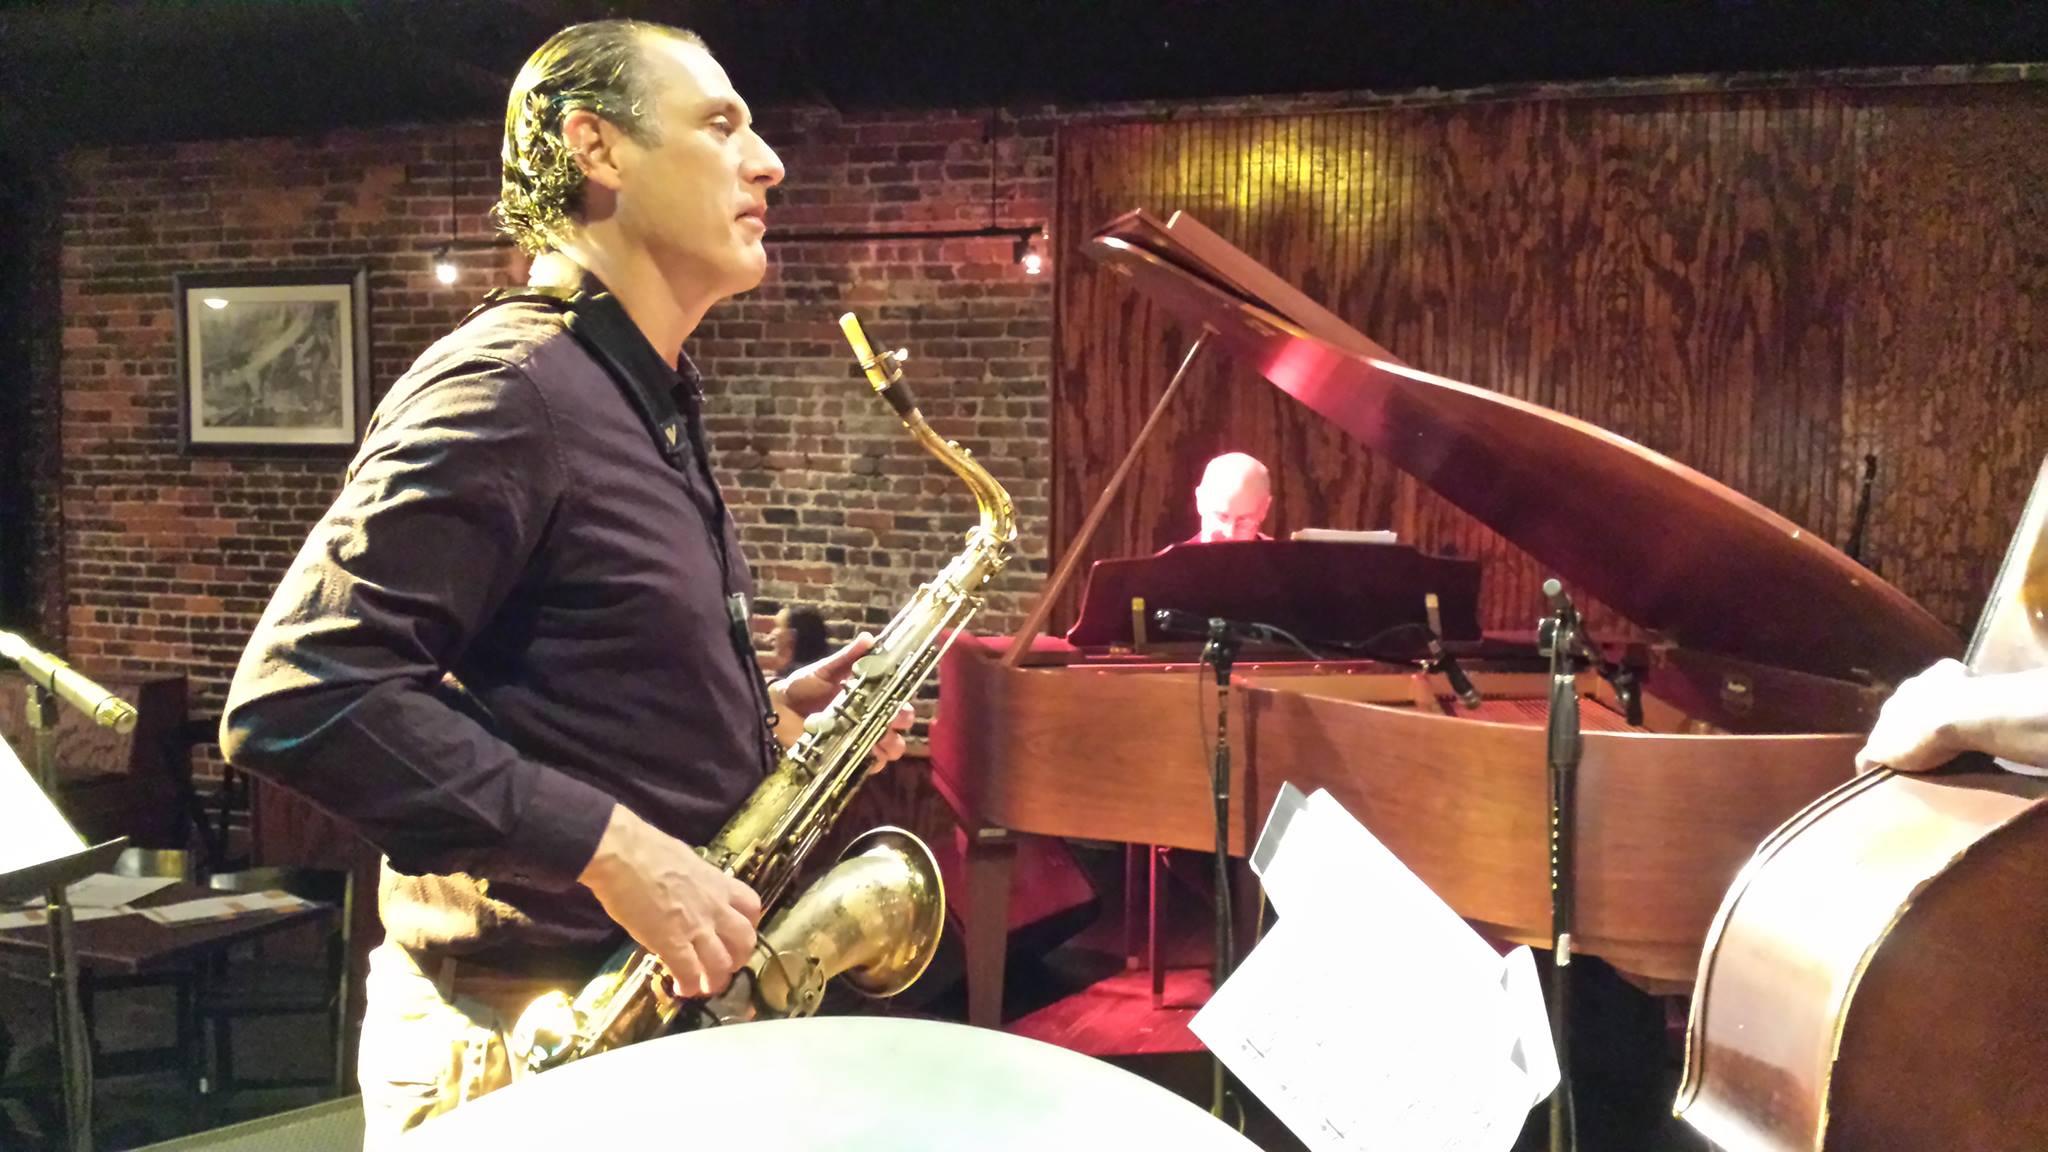 Ralph Bowen of Jae Sinnett's Zero to 60 Quartet performing at the Capital Ale House in Richmond, VA in 2016